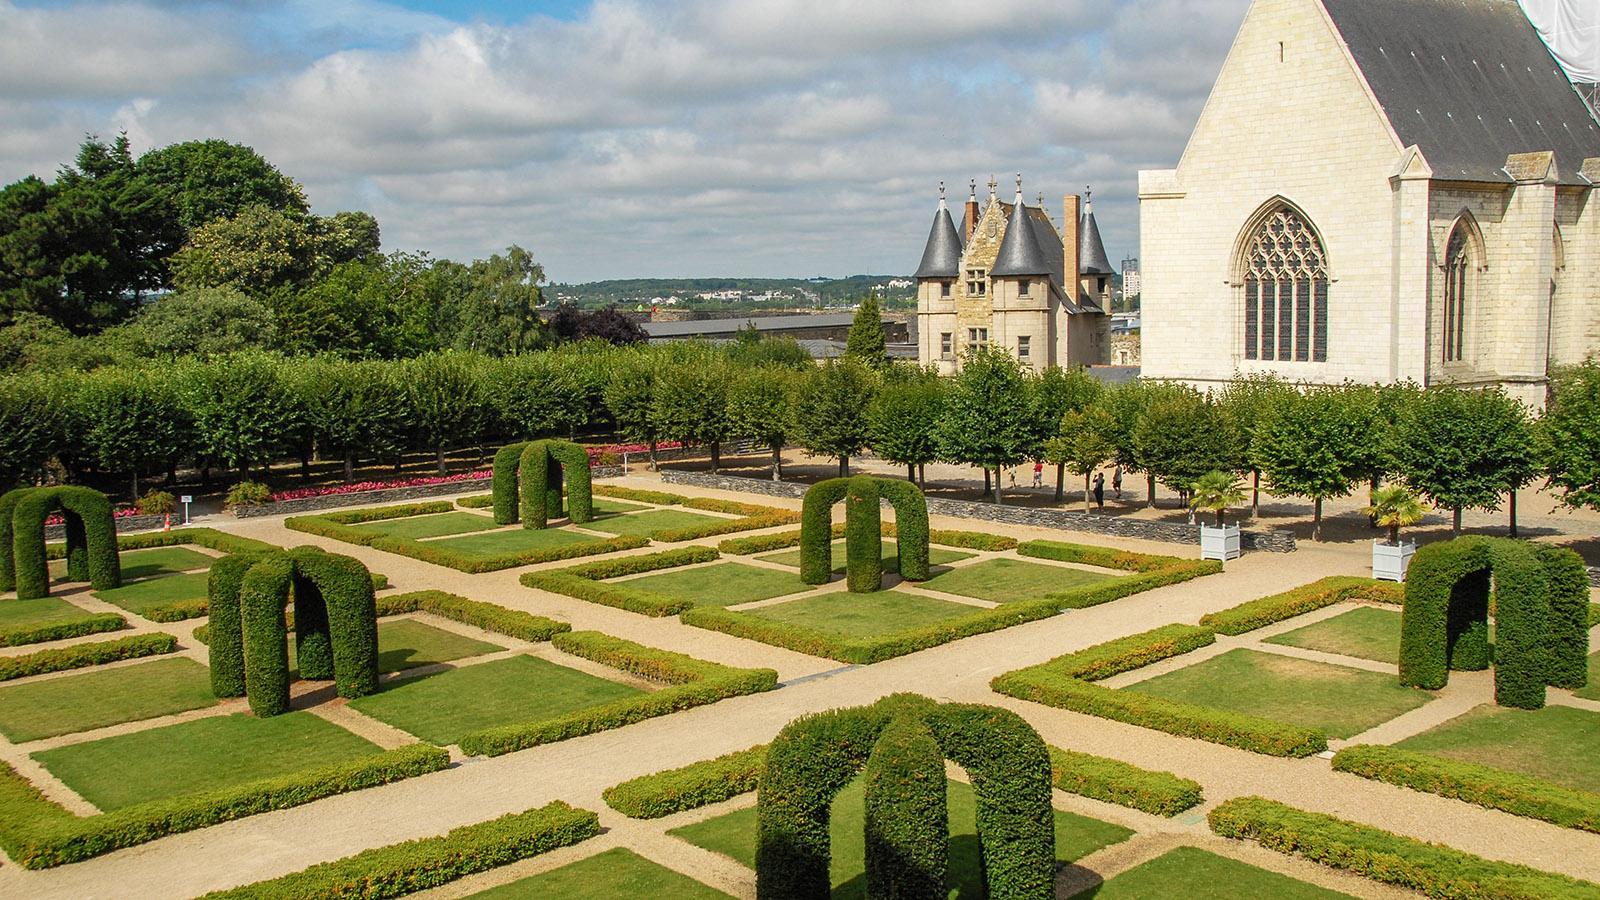 Französisch ornamental: der Schlossgarten des Château d'Angers. Foto: Hilke Maunder